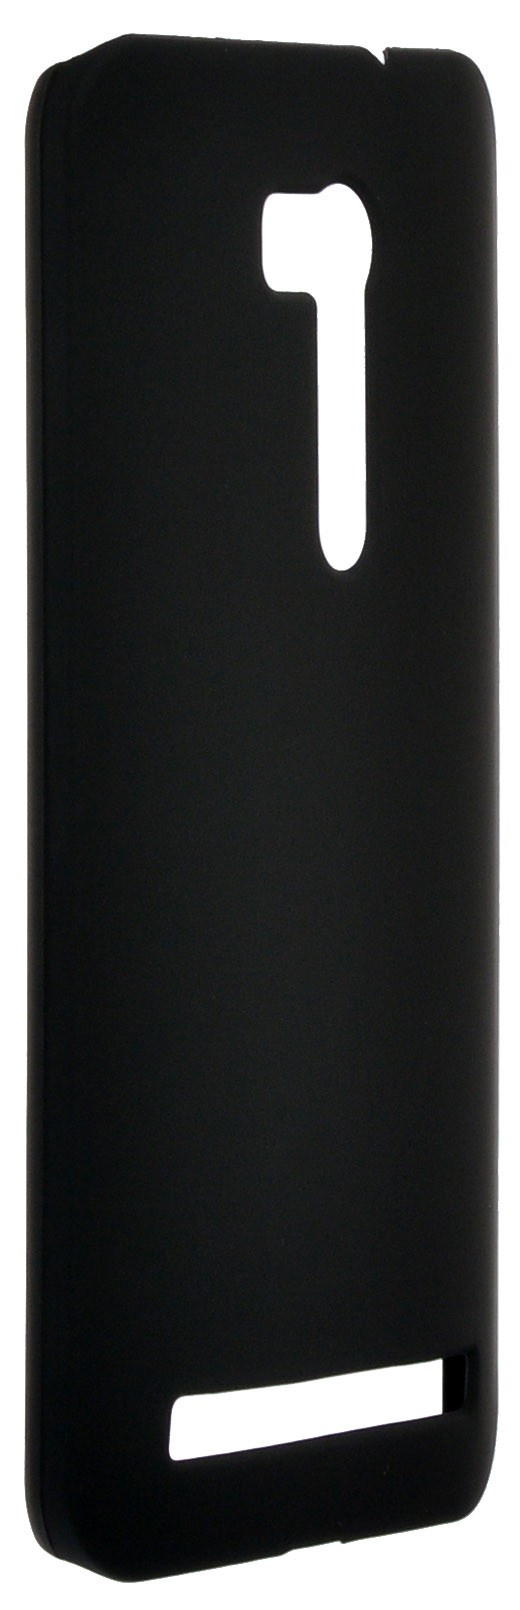 Чехол для сотового телефона skinBOX 4People, 4660041407518, черный аксессуар чехол asus zenfone 3 zc551kl skinbox 4people red t s azzc551kl 002 защитная пленка